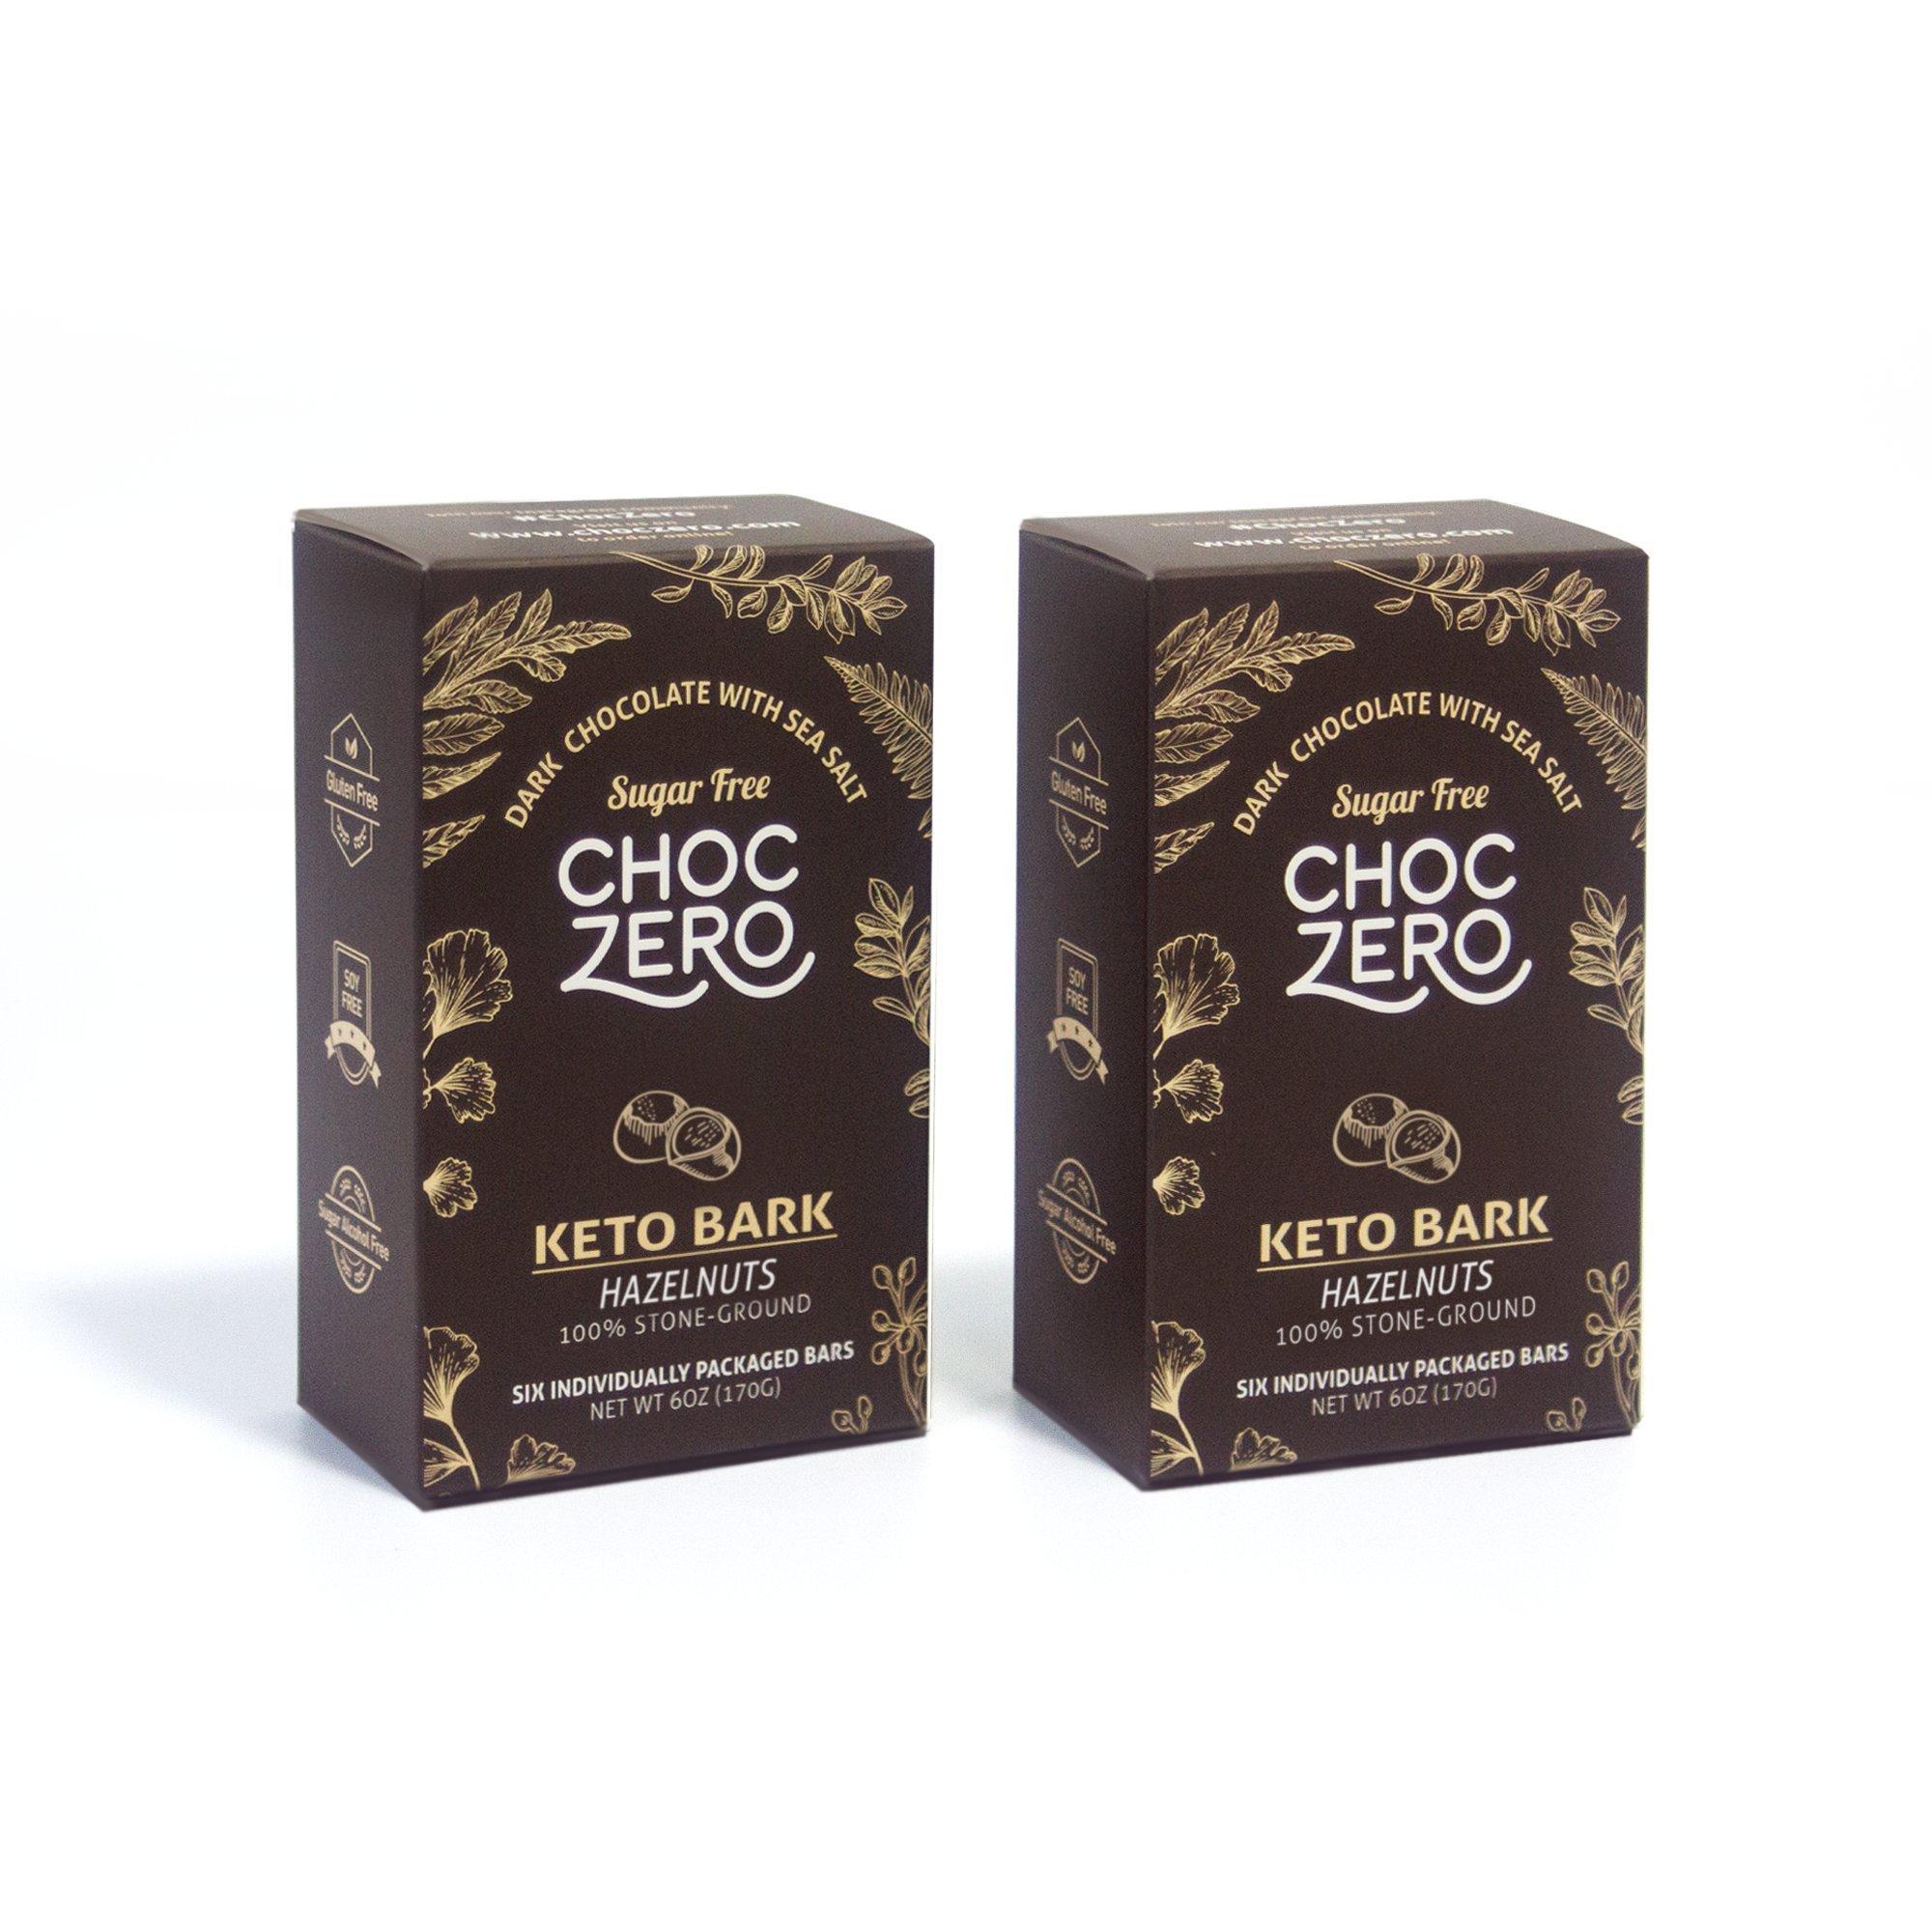 ChocZero's Keto Bark, Dark Chocolate Hazelnuts with Sea Salt. 100% Stone-Ground, Sugar Free, Low Carb. No Sugar Alcohols, No Artificial Sweeteners, All Natural, Non-GMO (2 boxes, 6 bars/each)